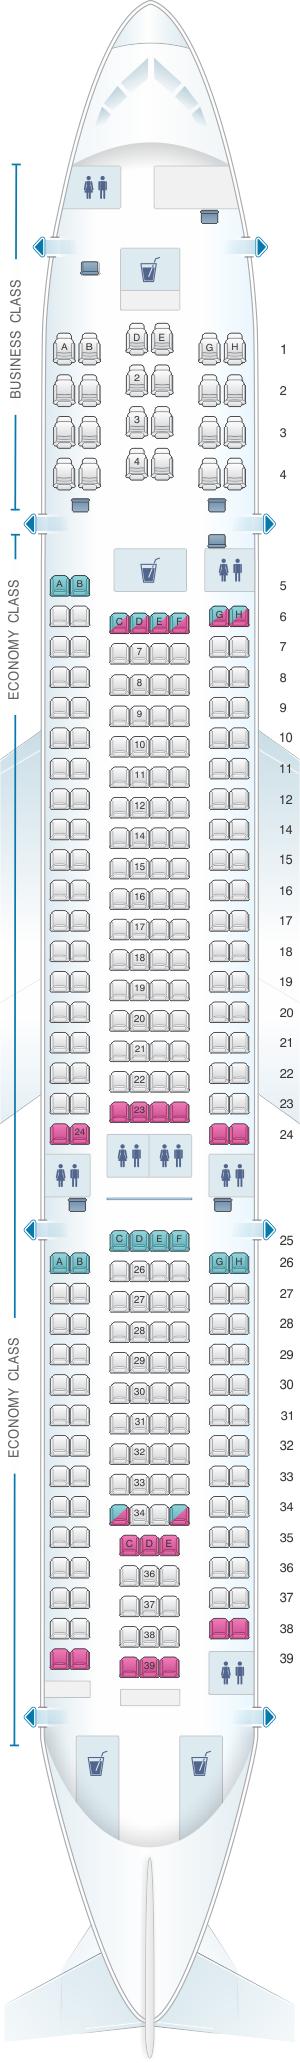 Seat Map Air Mauritius Airbus A330 200 Seatmaestro